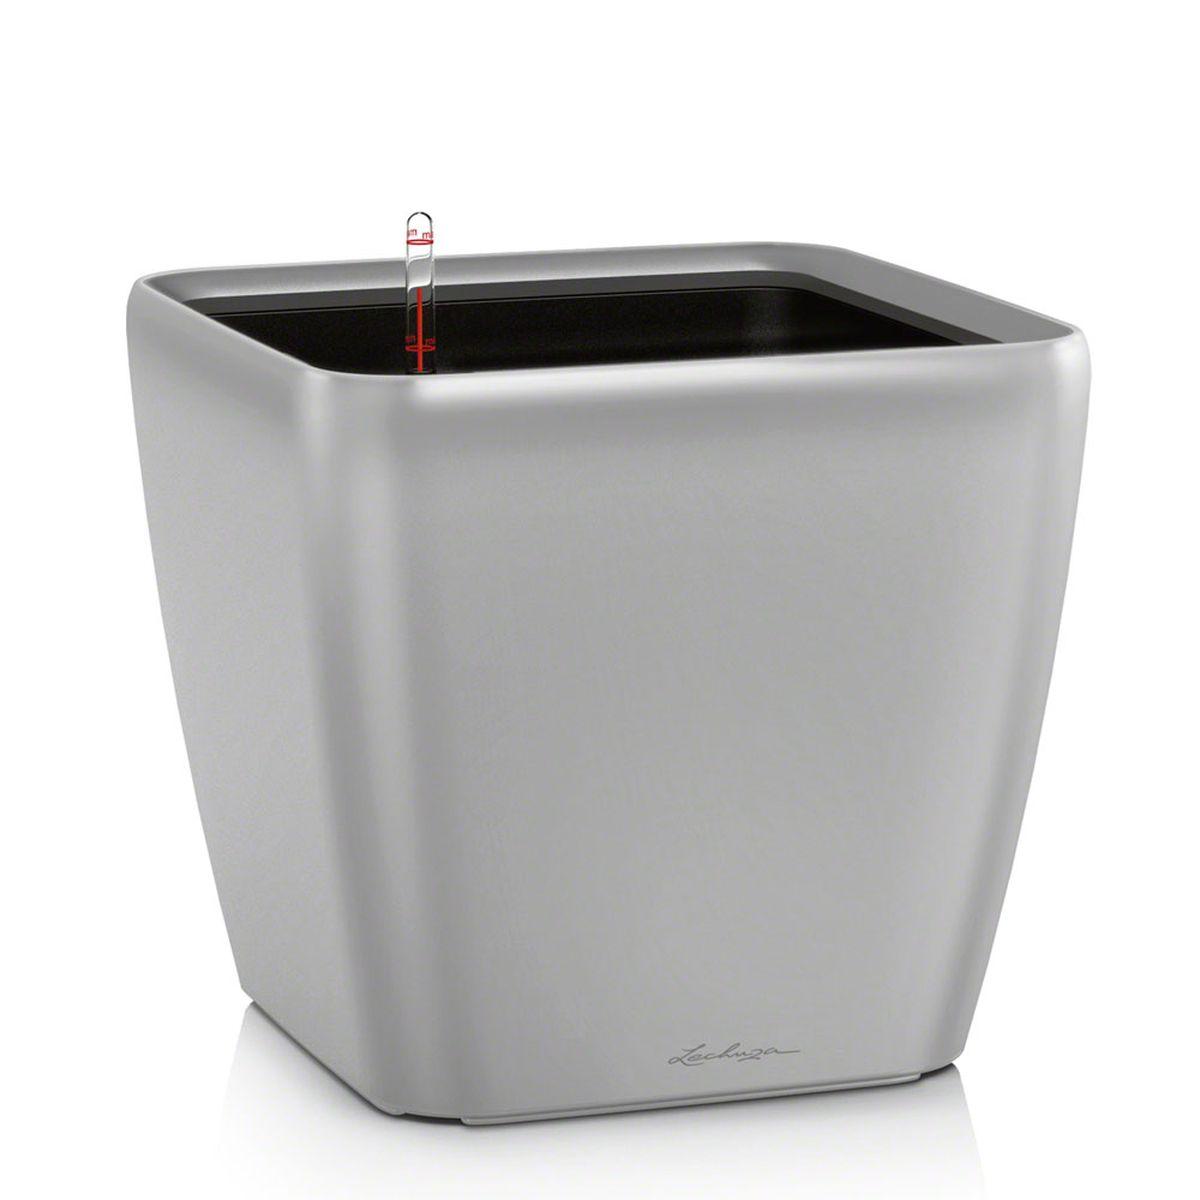 "Кашпо Lechuza ""Quadro"", с системой автополива, цвет: серебристый, 43 х 43 х 40 см"